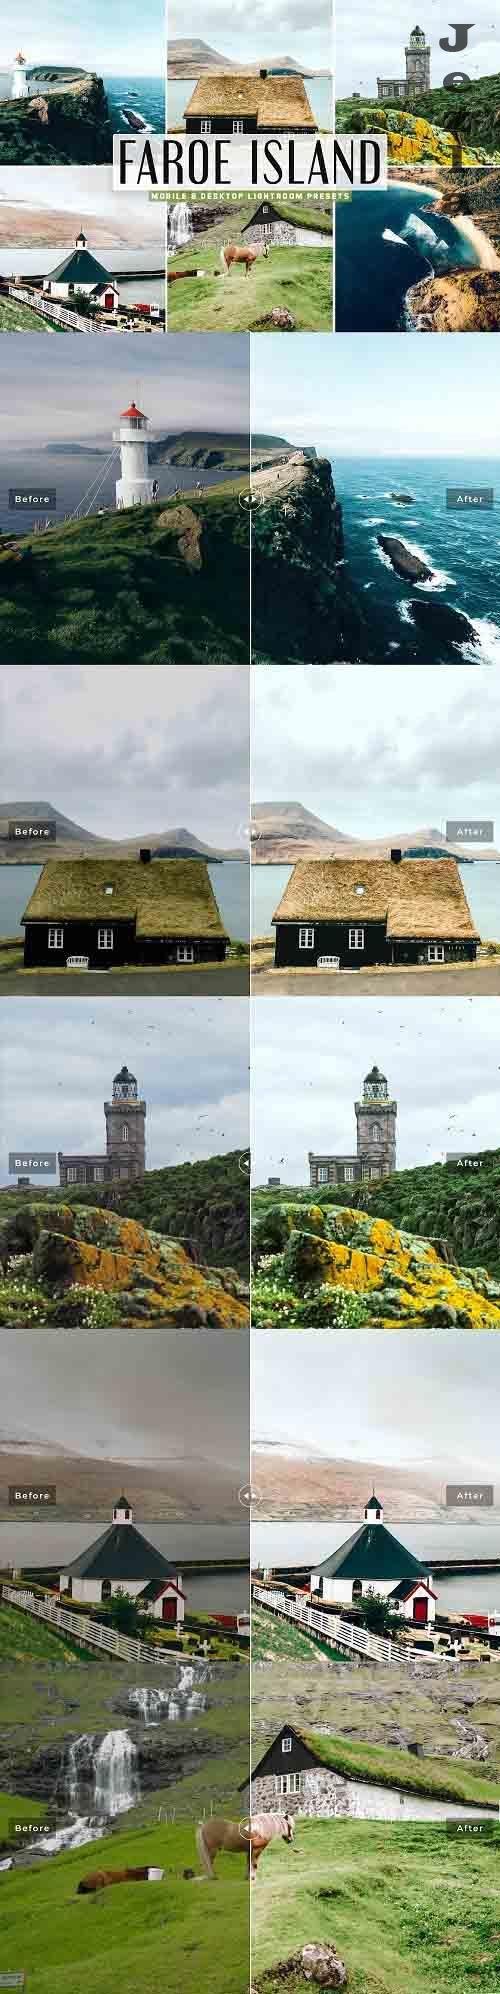 Faroe Island Pro Lightroom Presets - 5336449 - Mobile & Desktop